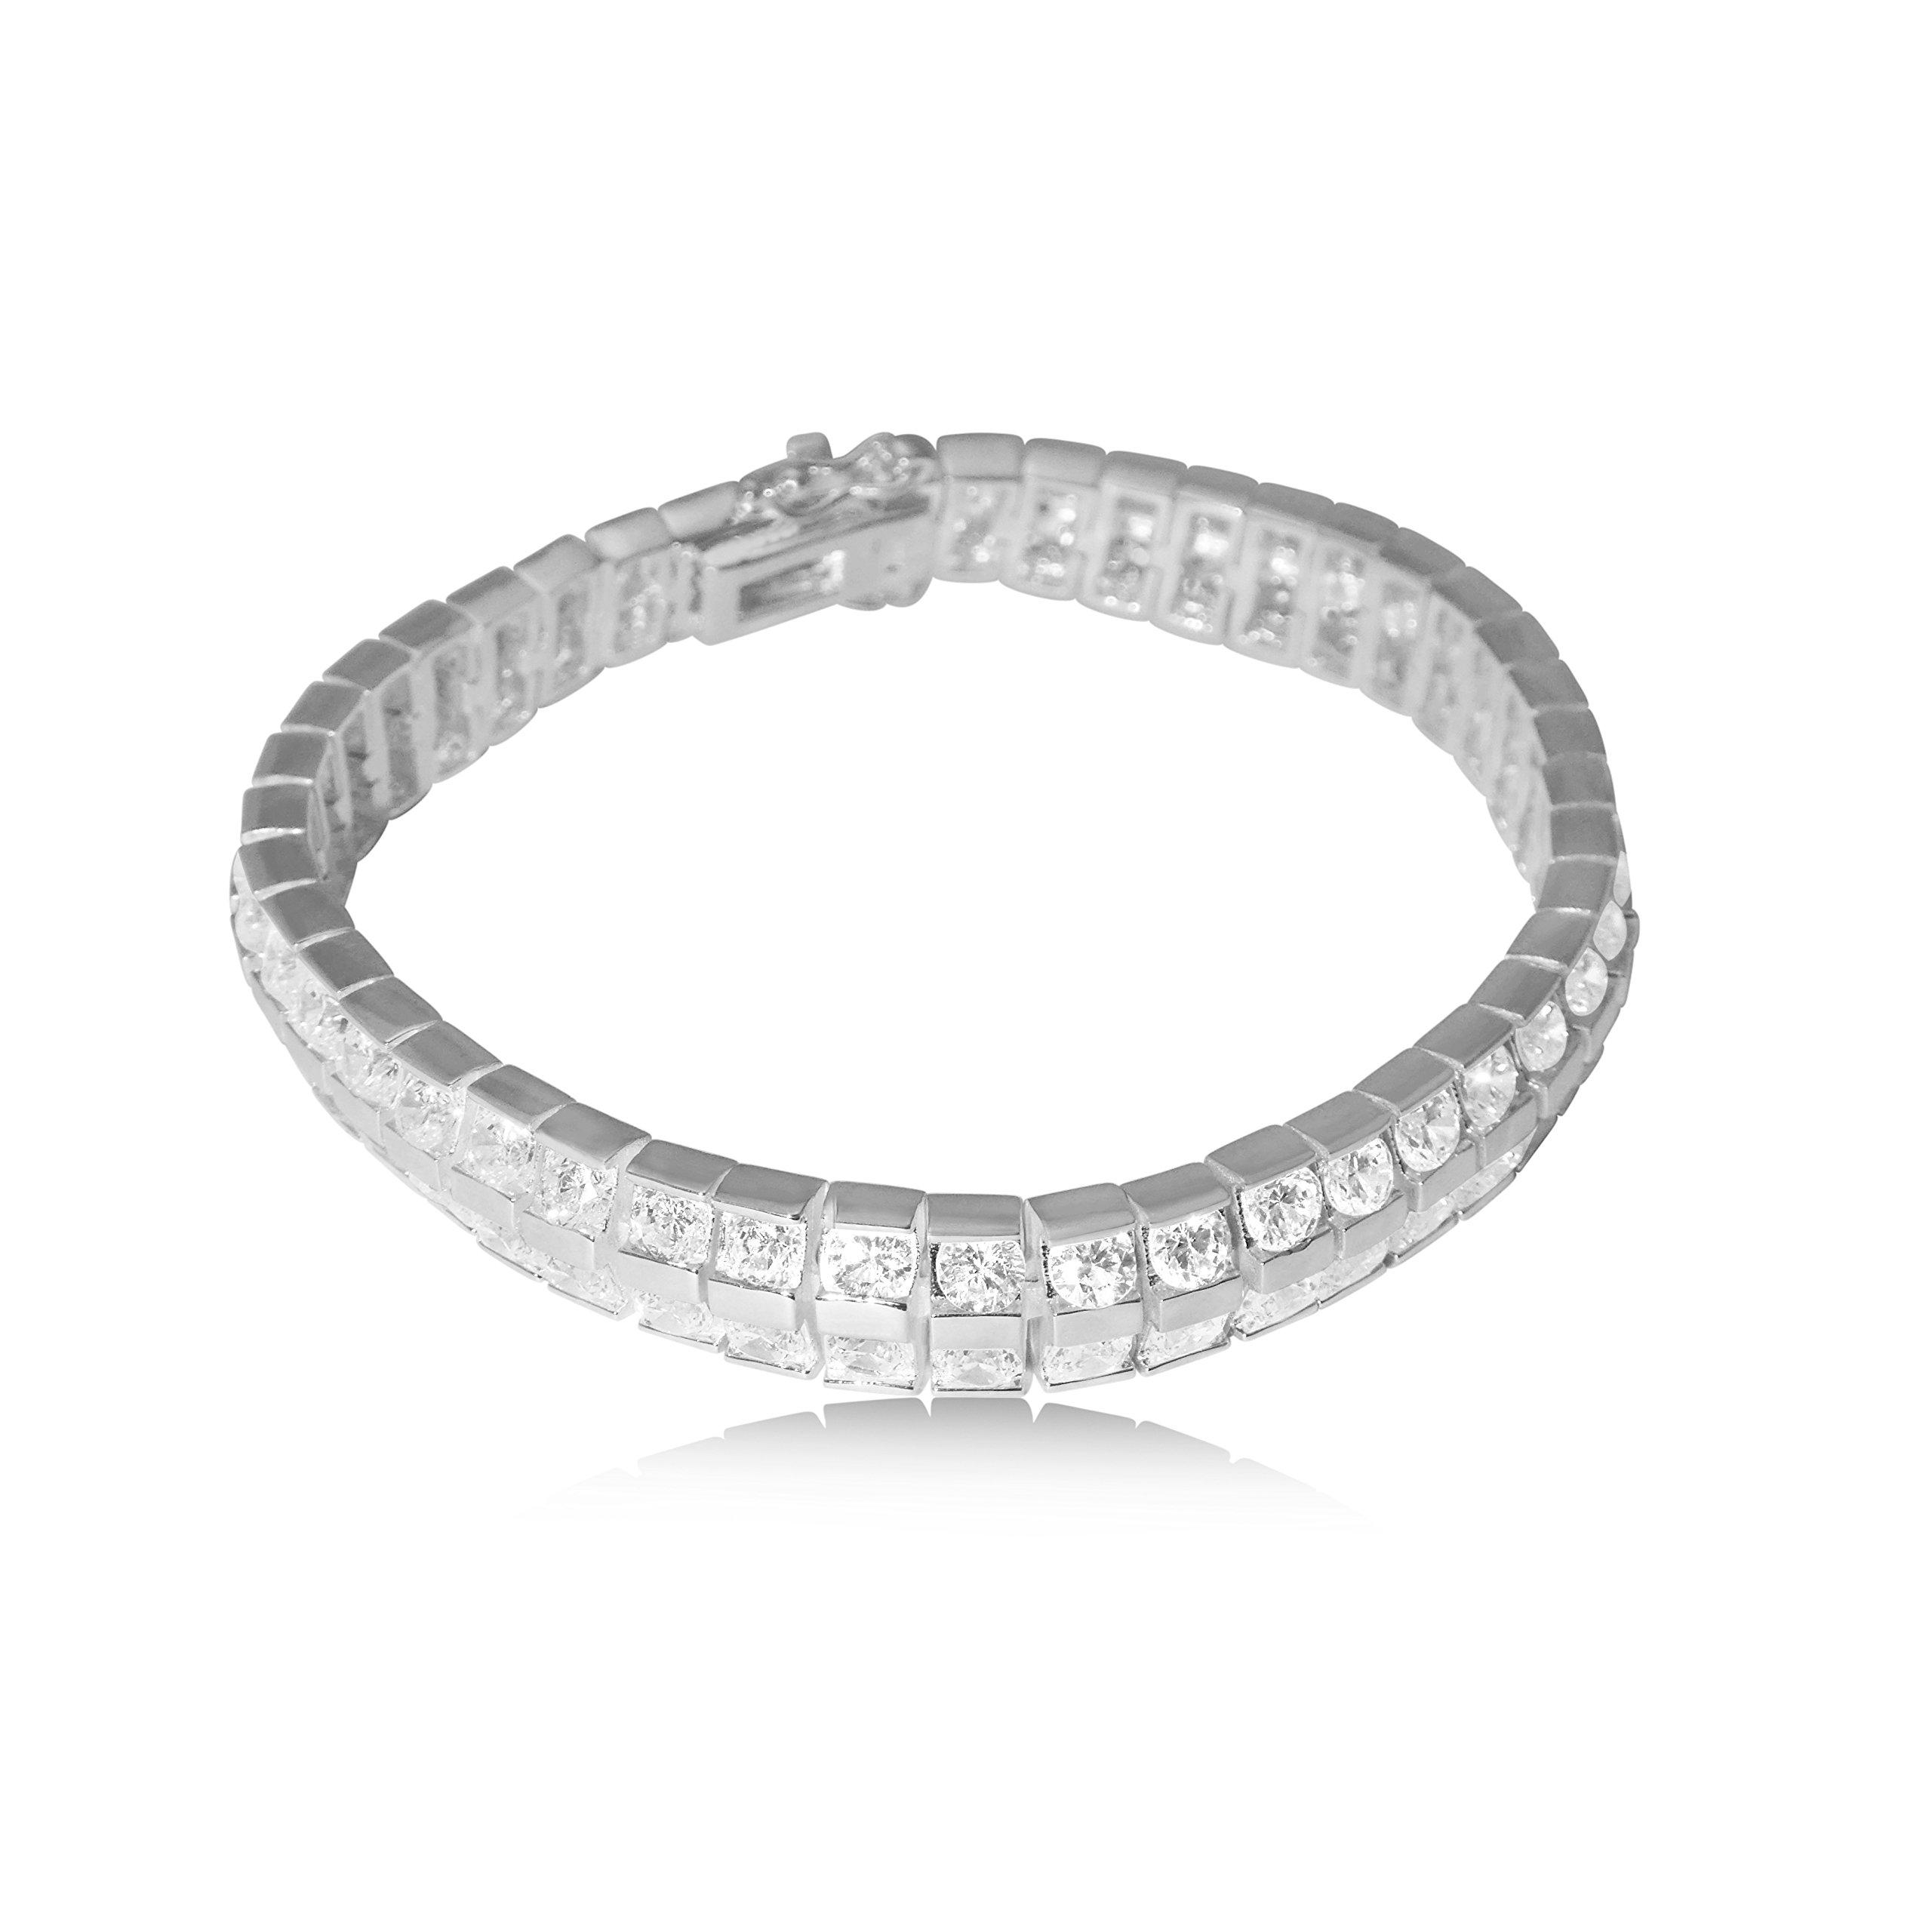 CORTINA JEWELRY - Cubic Zirconia Crystal & Sterling Wrap Bracelet - Premium Heavy Rhodium - Made in America